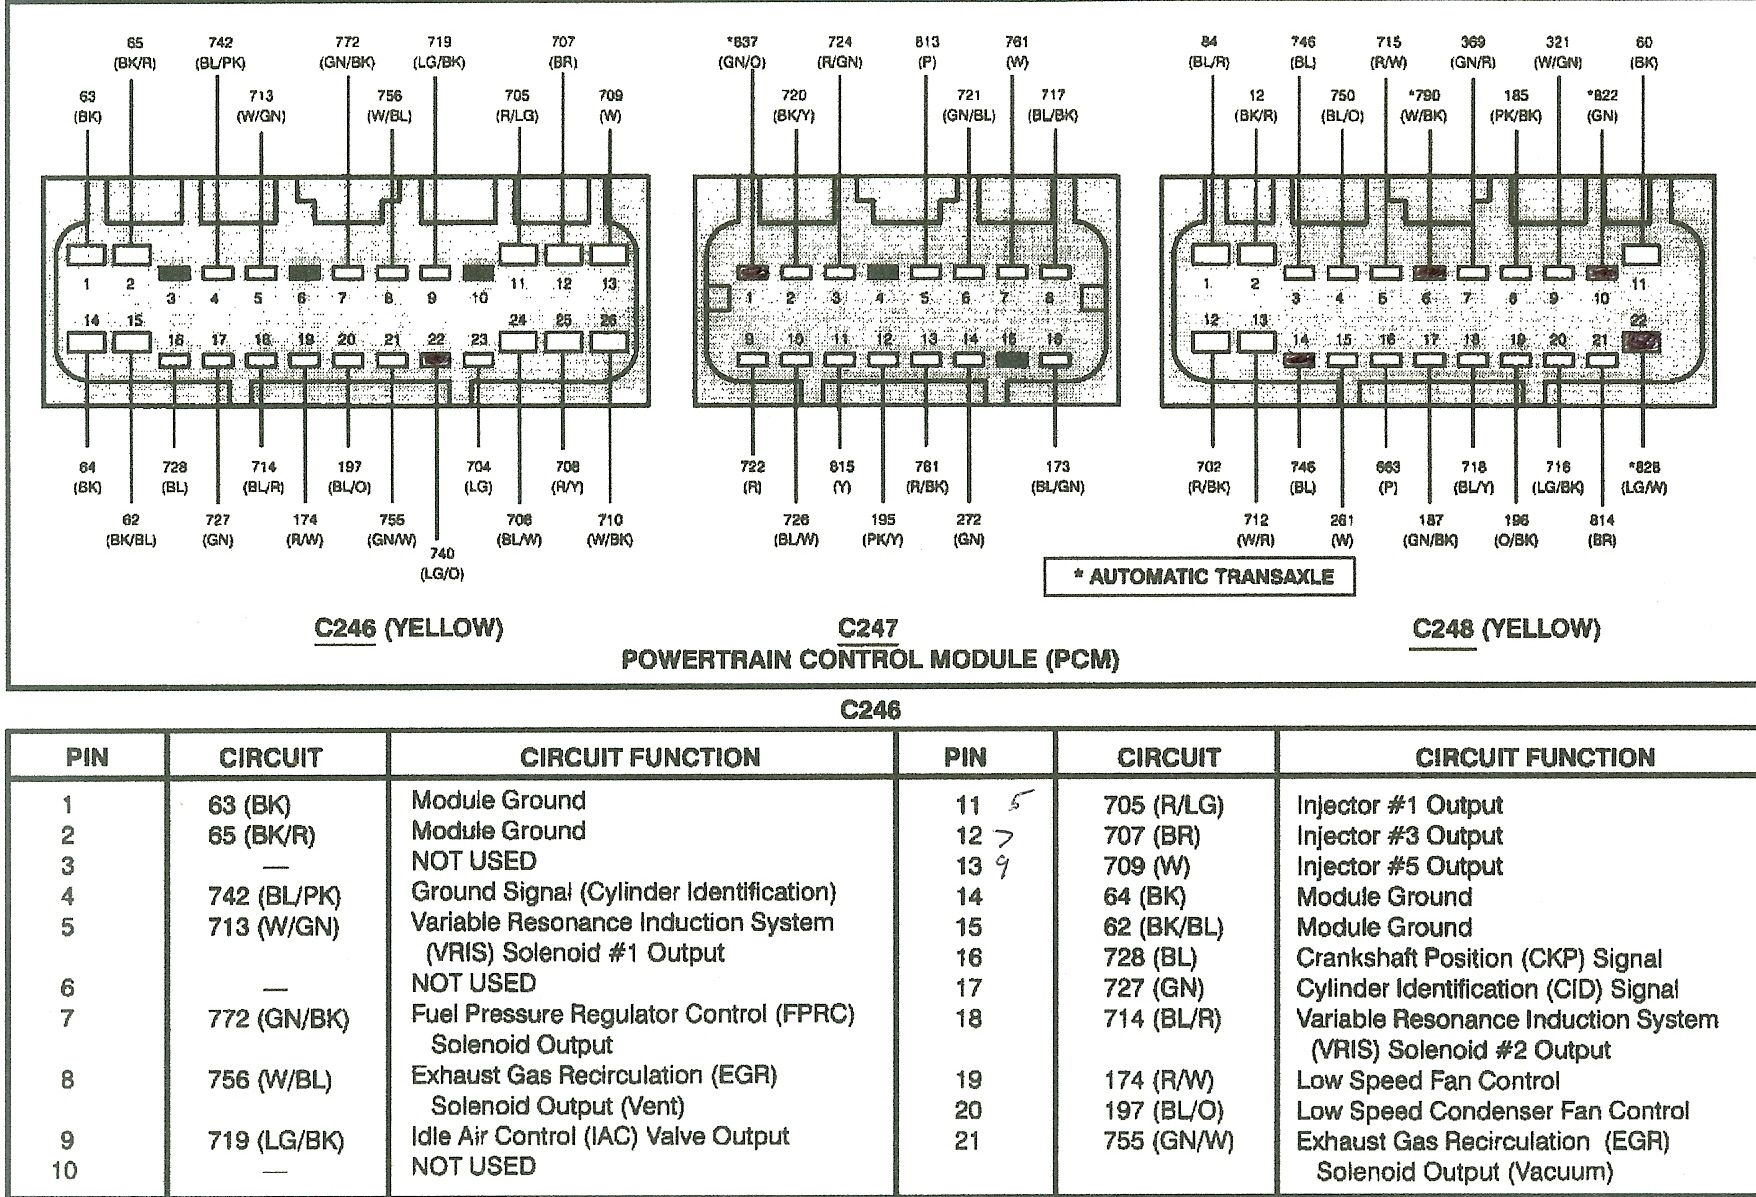 hight resolution of pinouts wiring diagram pcm to ecm 4 7 2002 dodge ram intoautos com 2002 dodge durango pcm wiring diagram